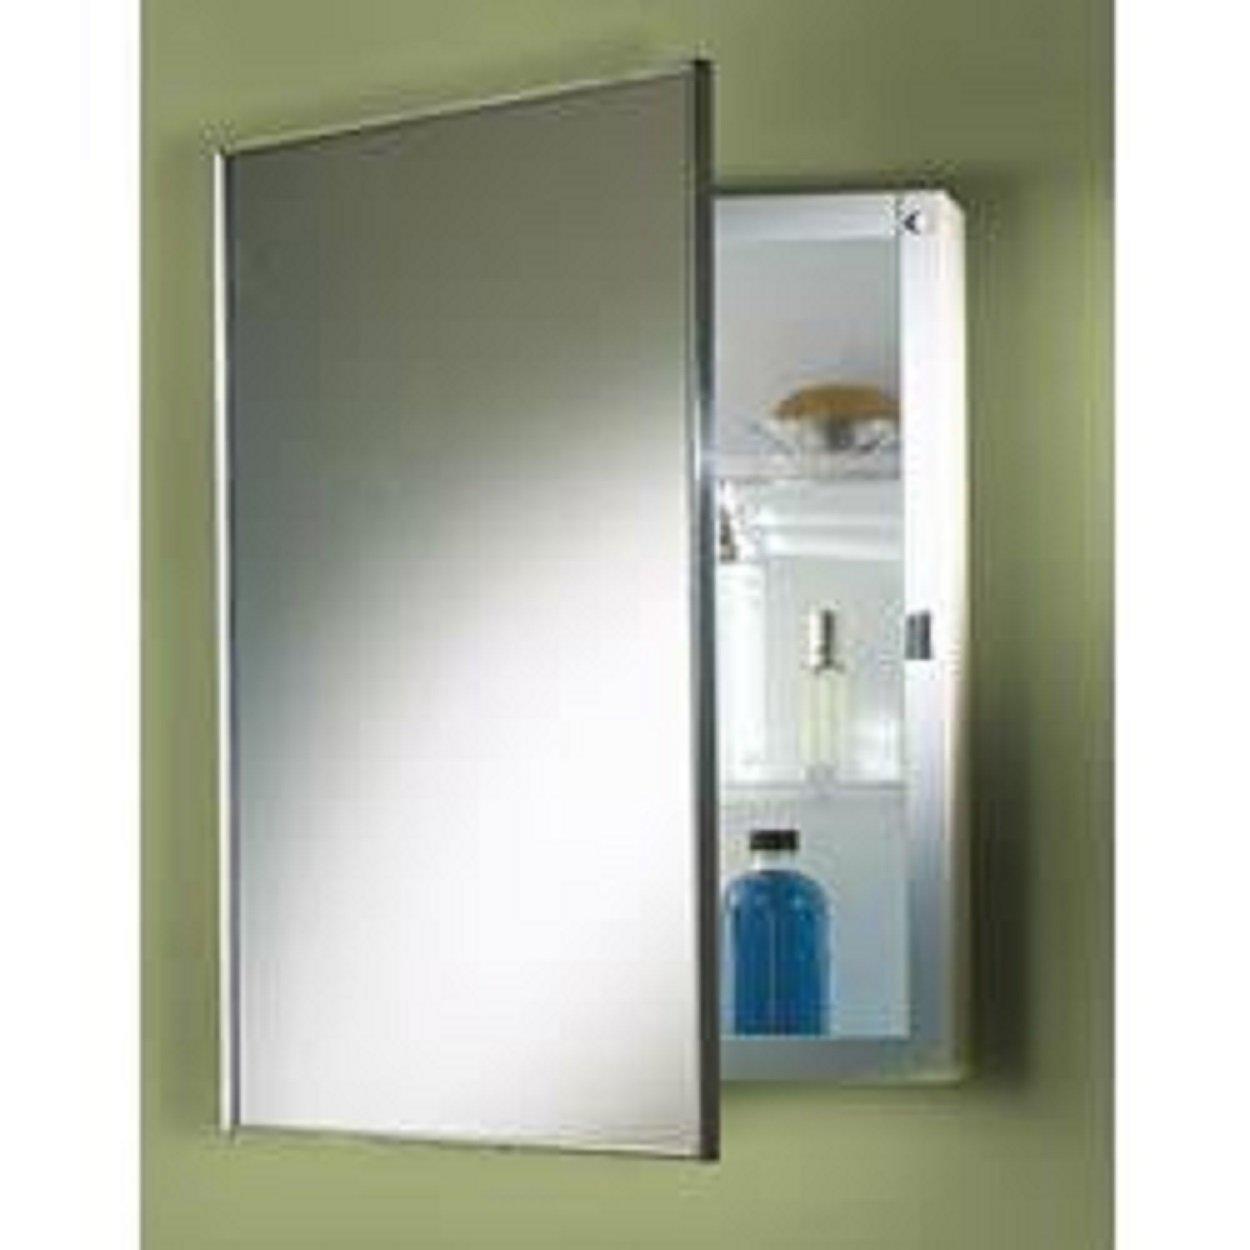 Aluminium Bathroom Cabinets Amazoncom Jensen 401adj Basic Styleline Recessed Molded Medicine